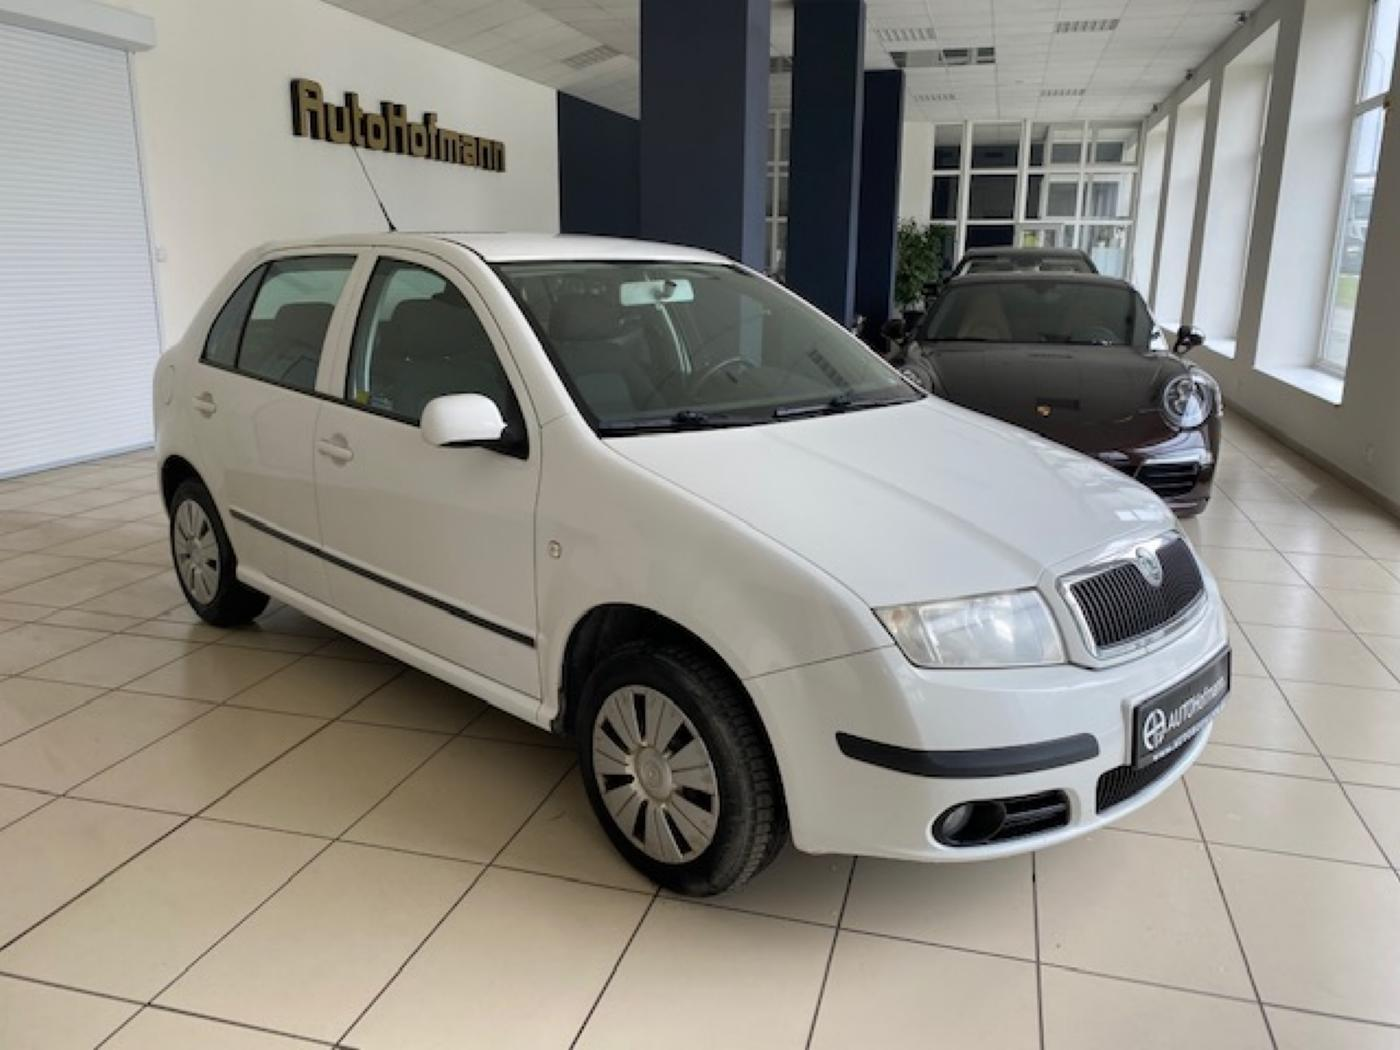 Škoda Fabia 1,9 SDi, koupeno v CZ hatchback